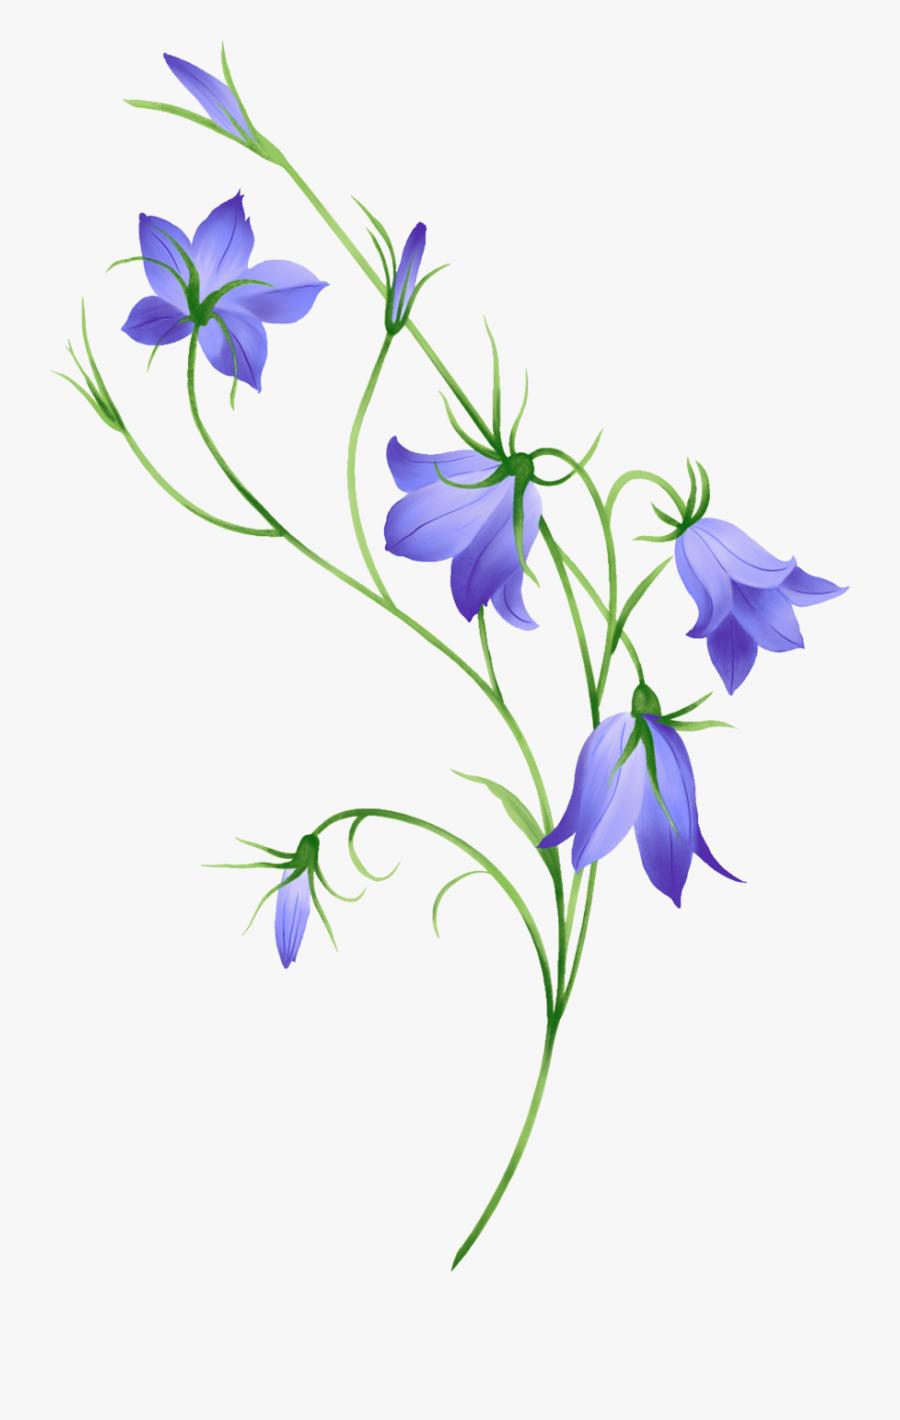 Morning Glory, Bellflower, Leaf, Nature - Flower Bell Design, Transparent Clipart